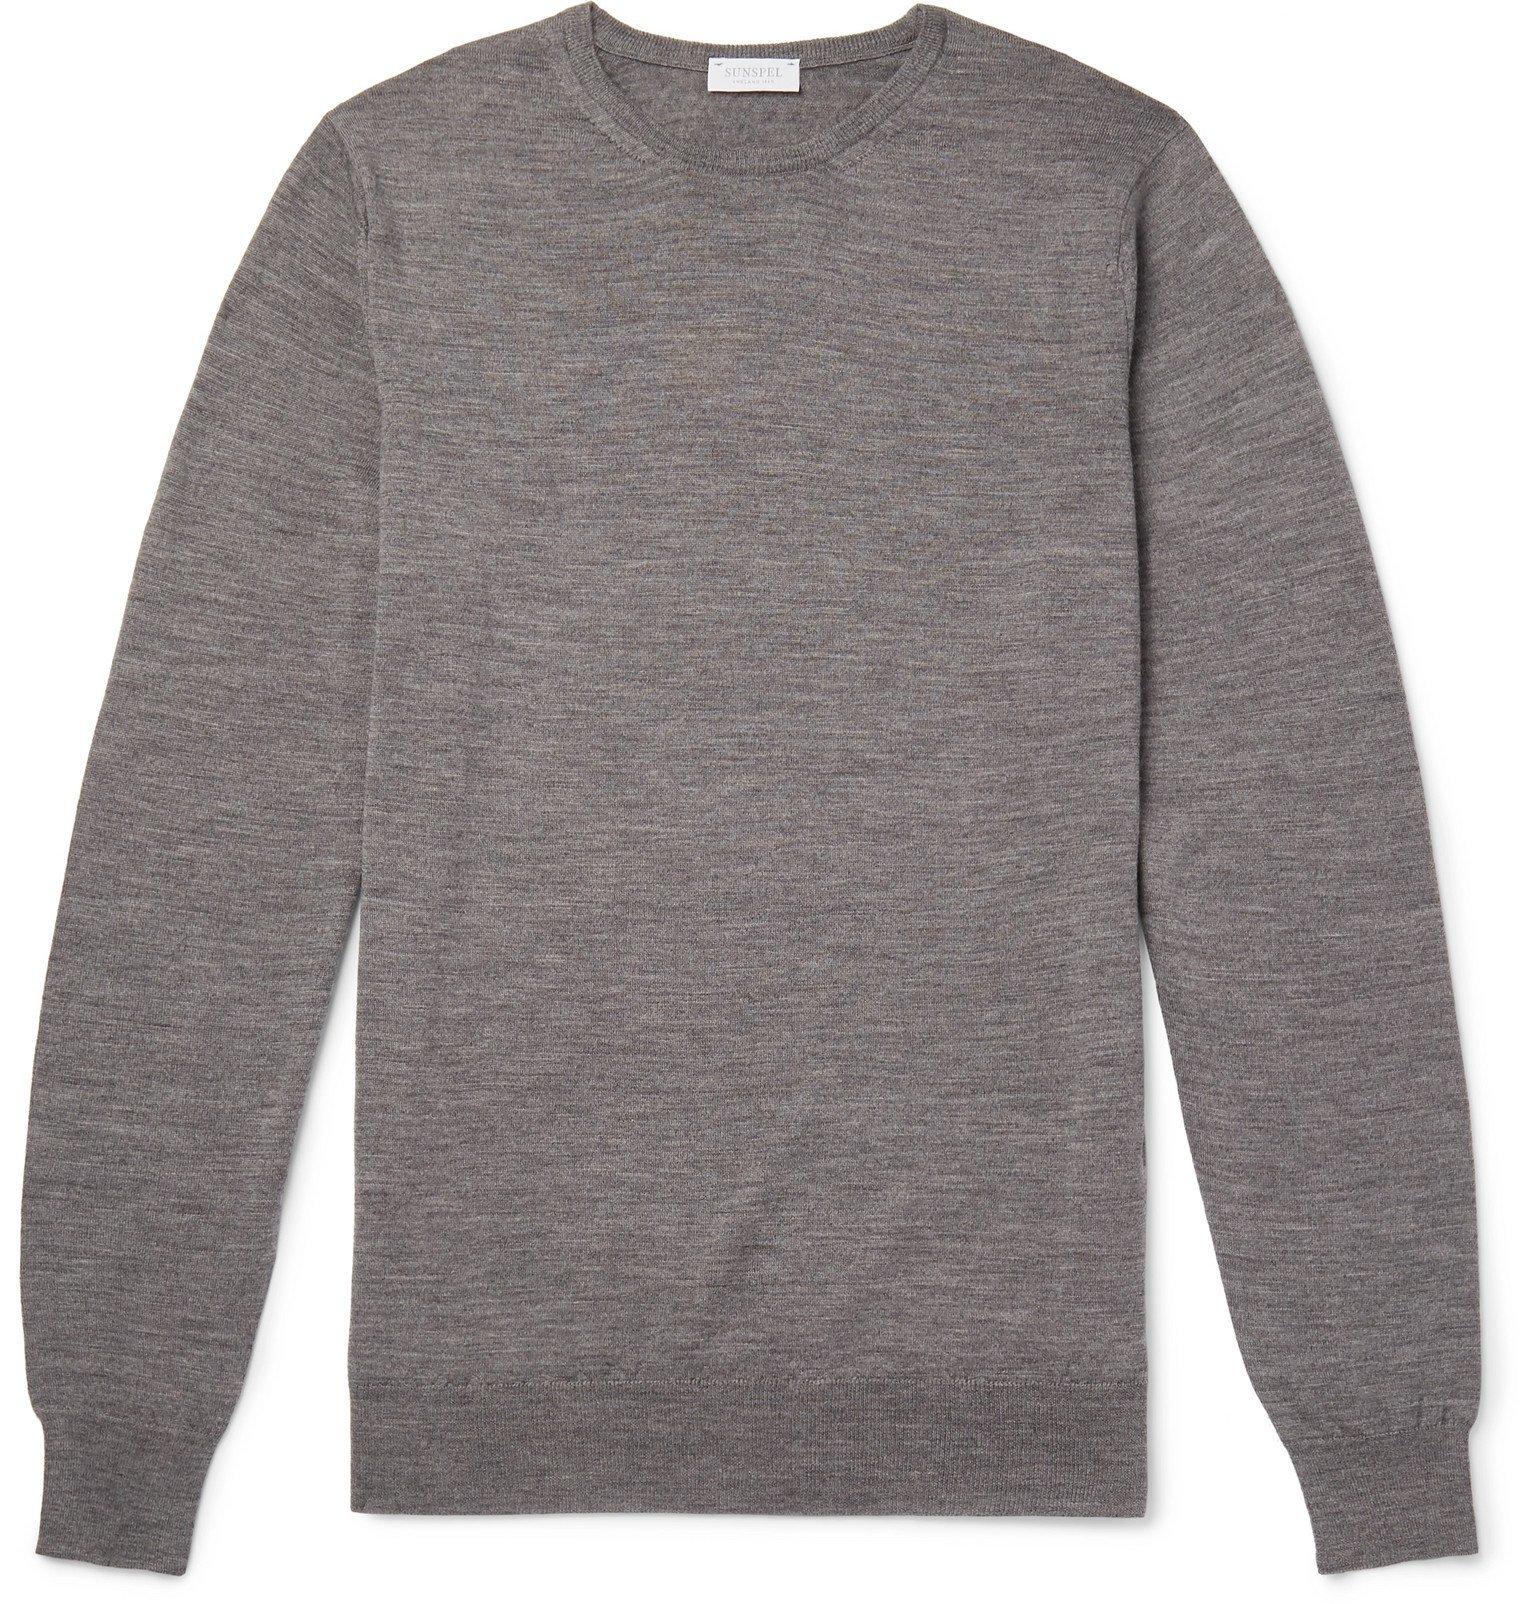 Sunspel - Slim-Fit Merino Wool Sweater - Gray